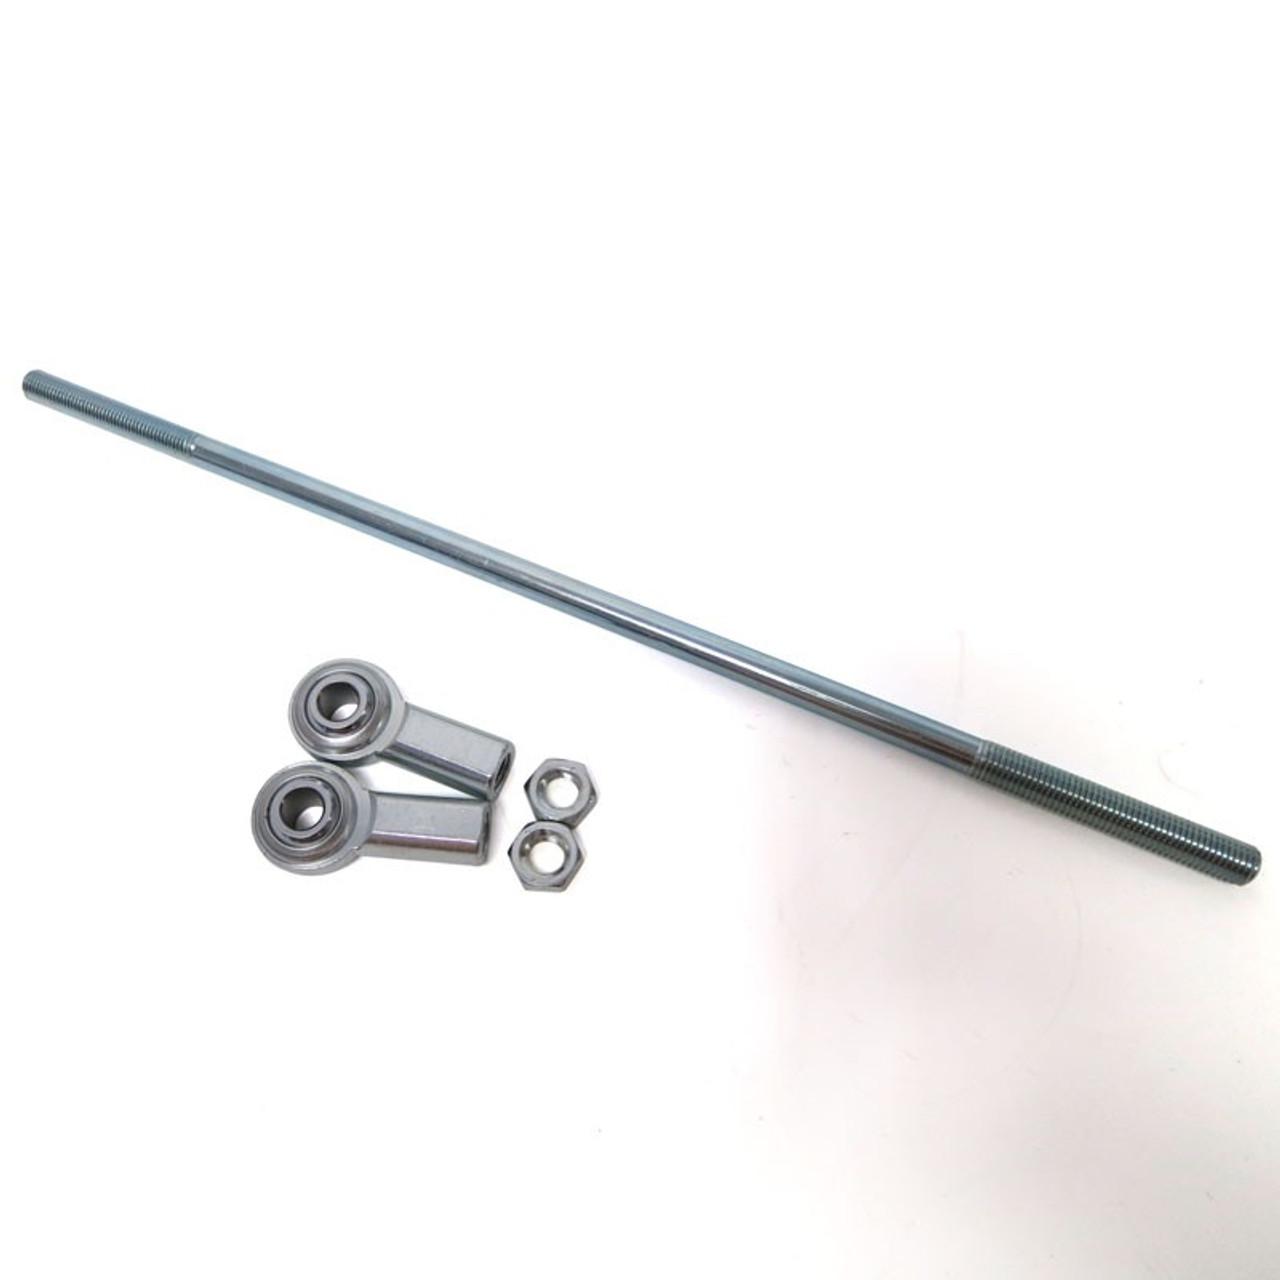 "5/16-24 x 11"" Deluxe Tie Rod Kit"